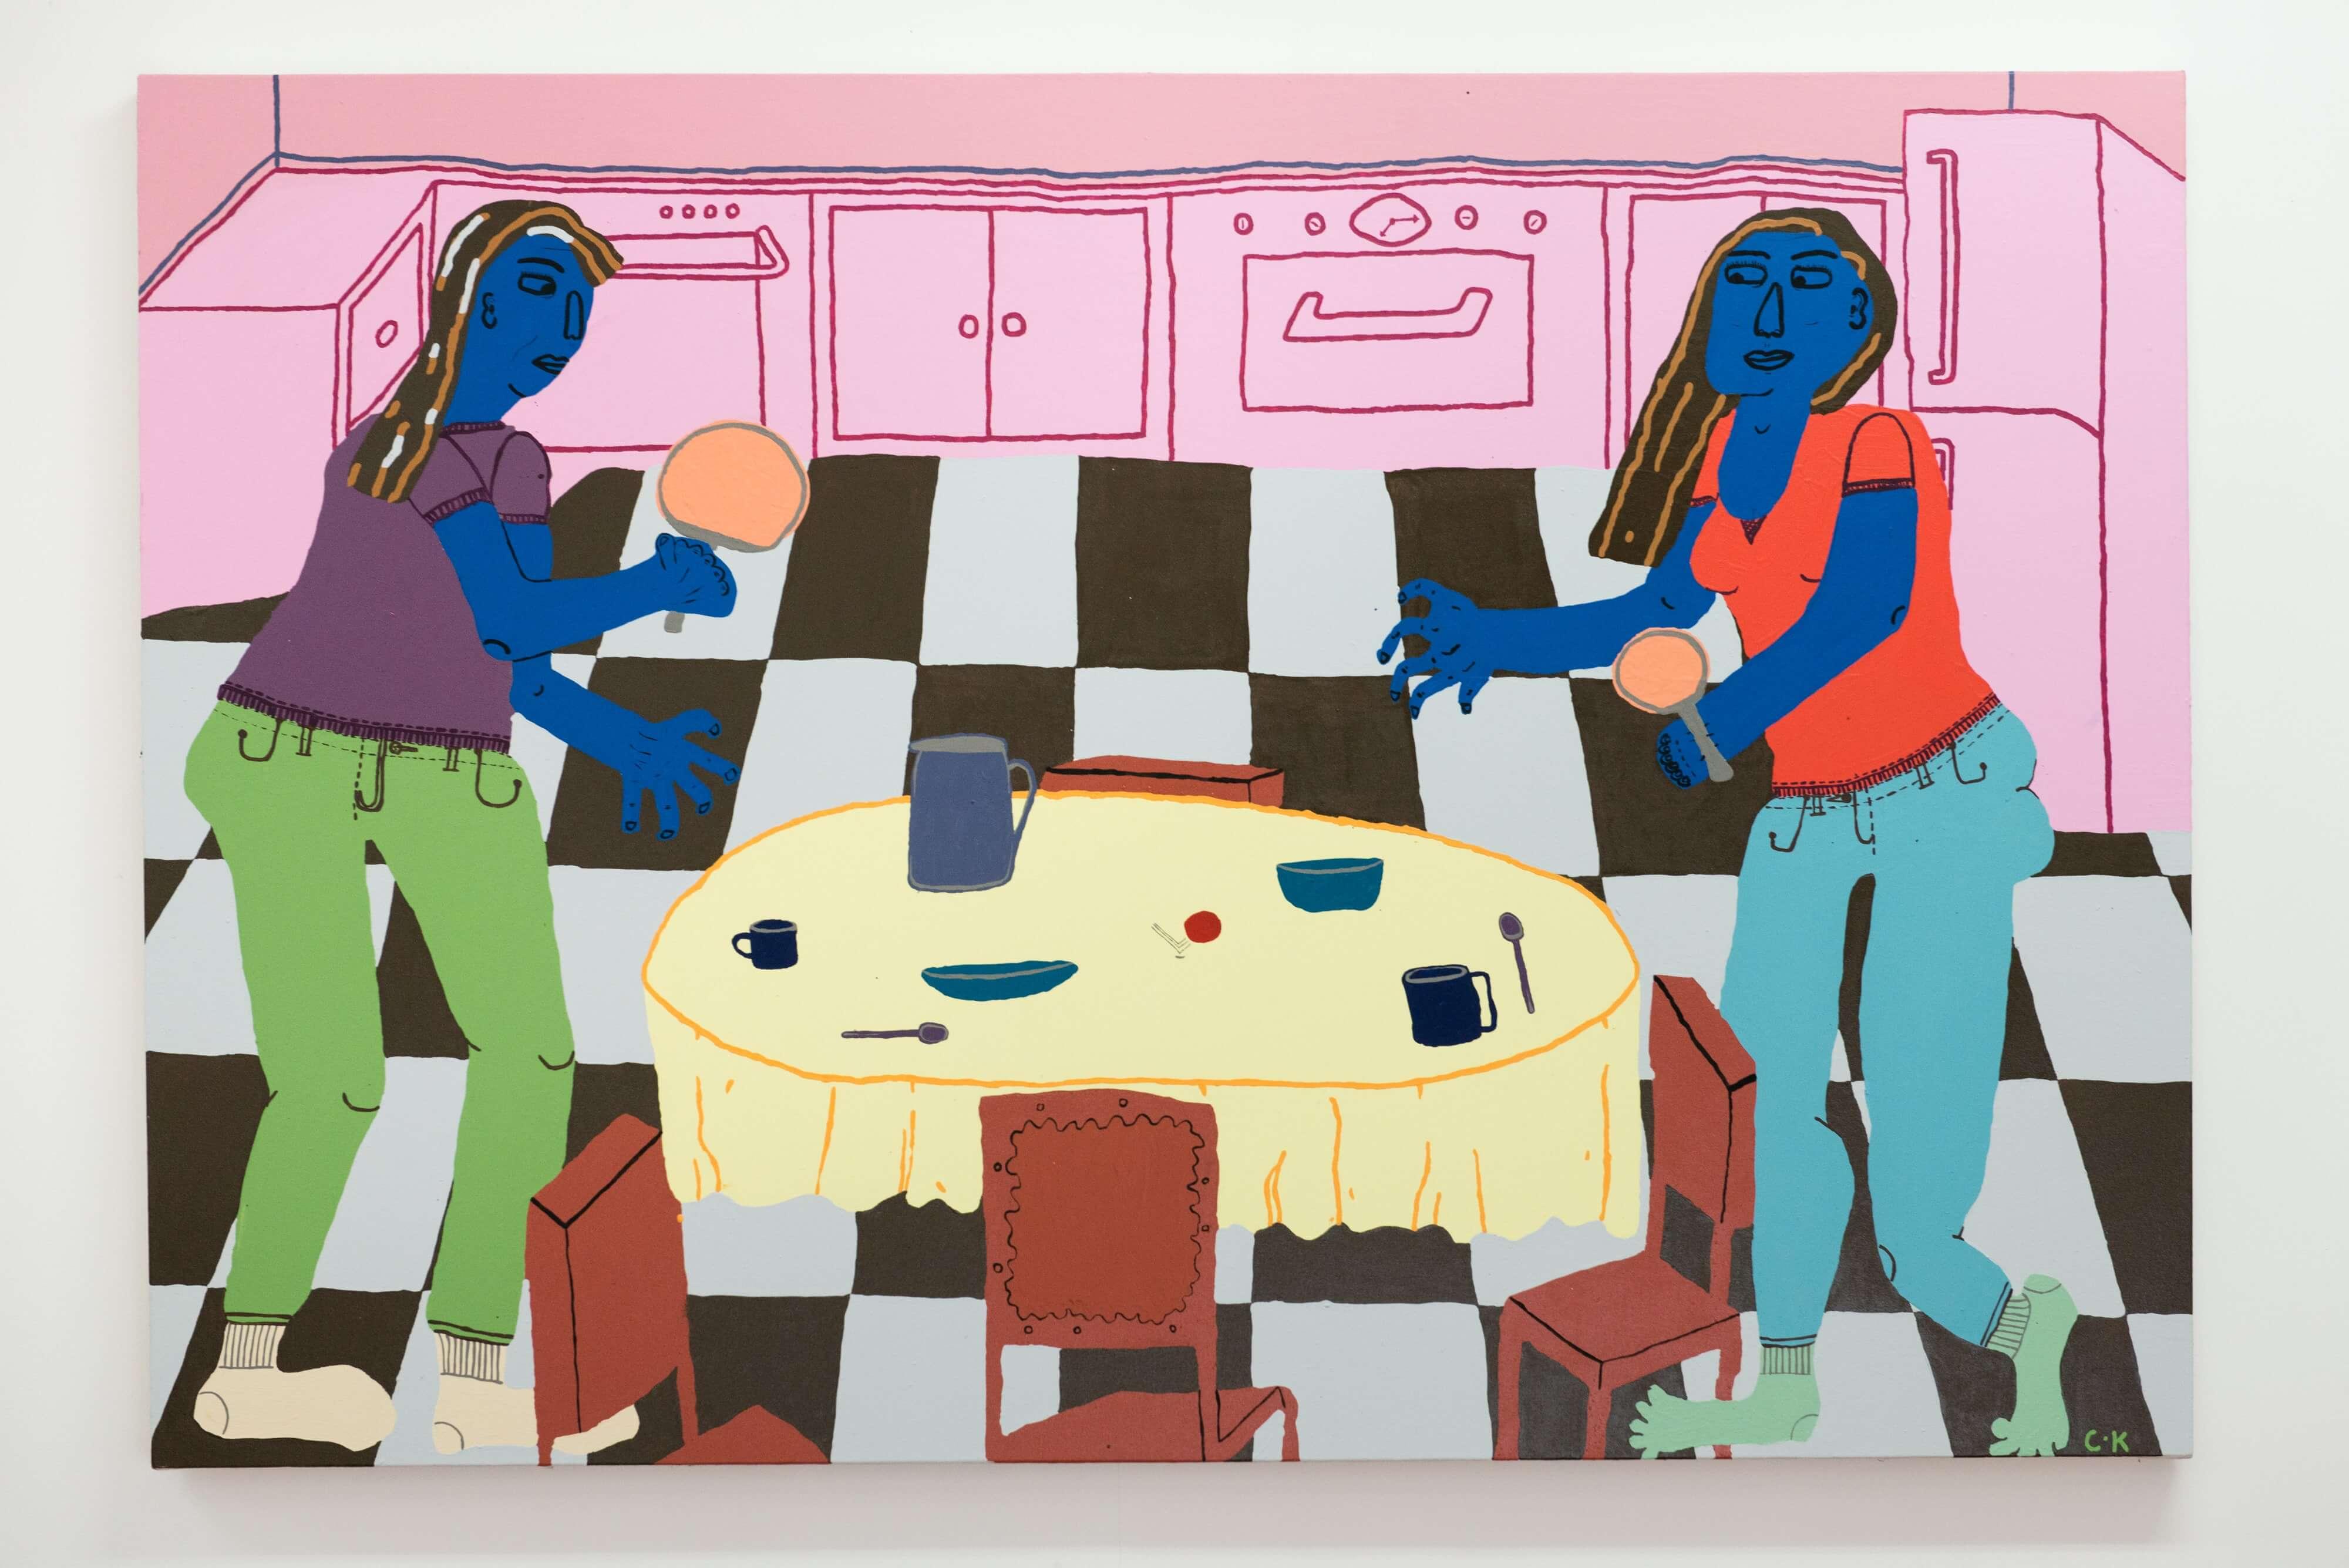 Claudia Kogachi. Table Tennis (2018). Acrylic on canvas. Courtesy of the artist.